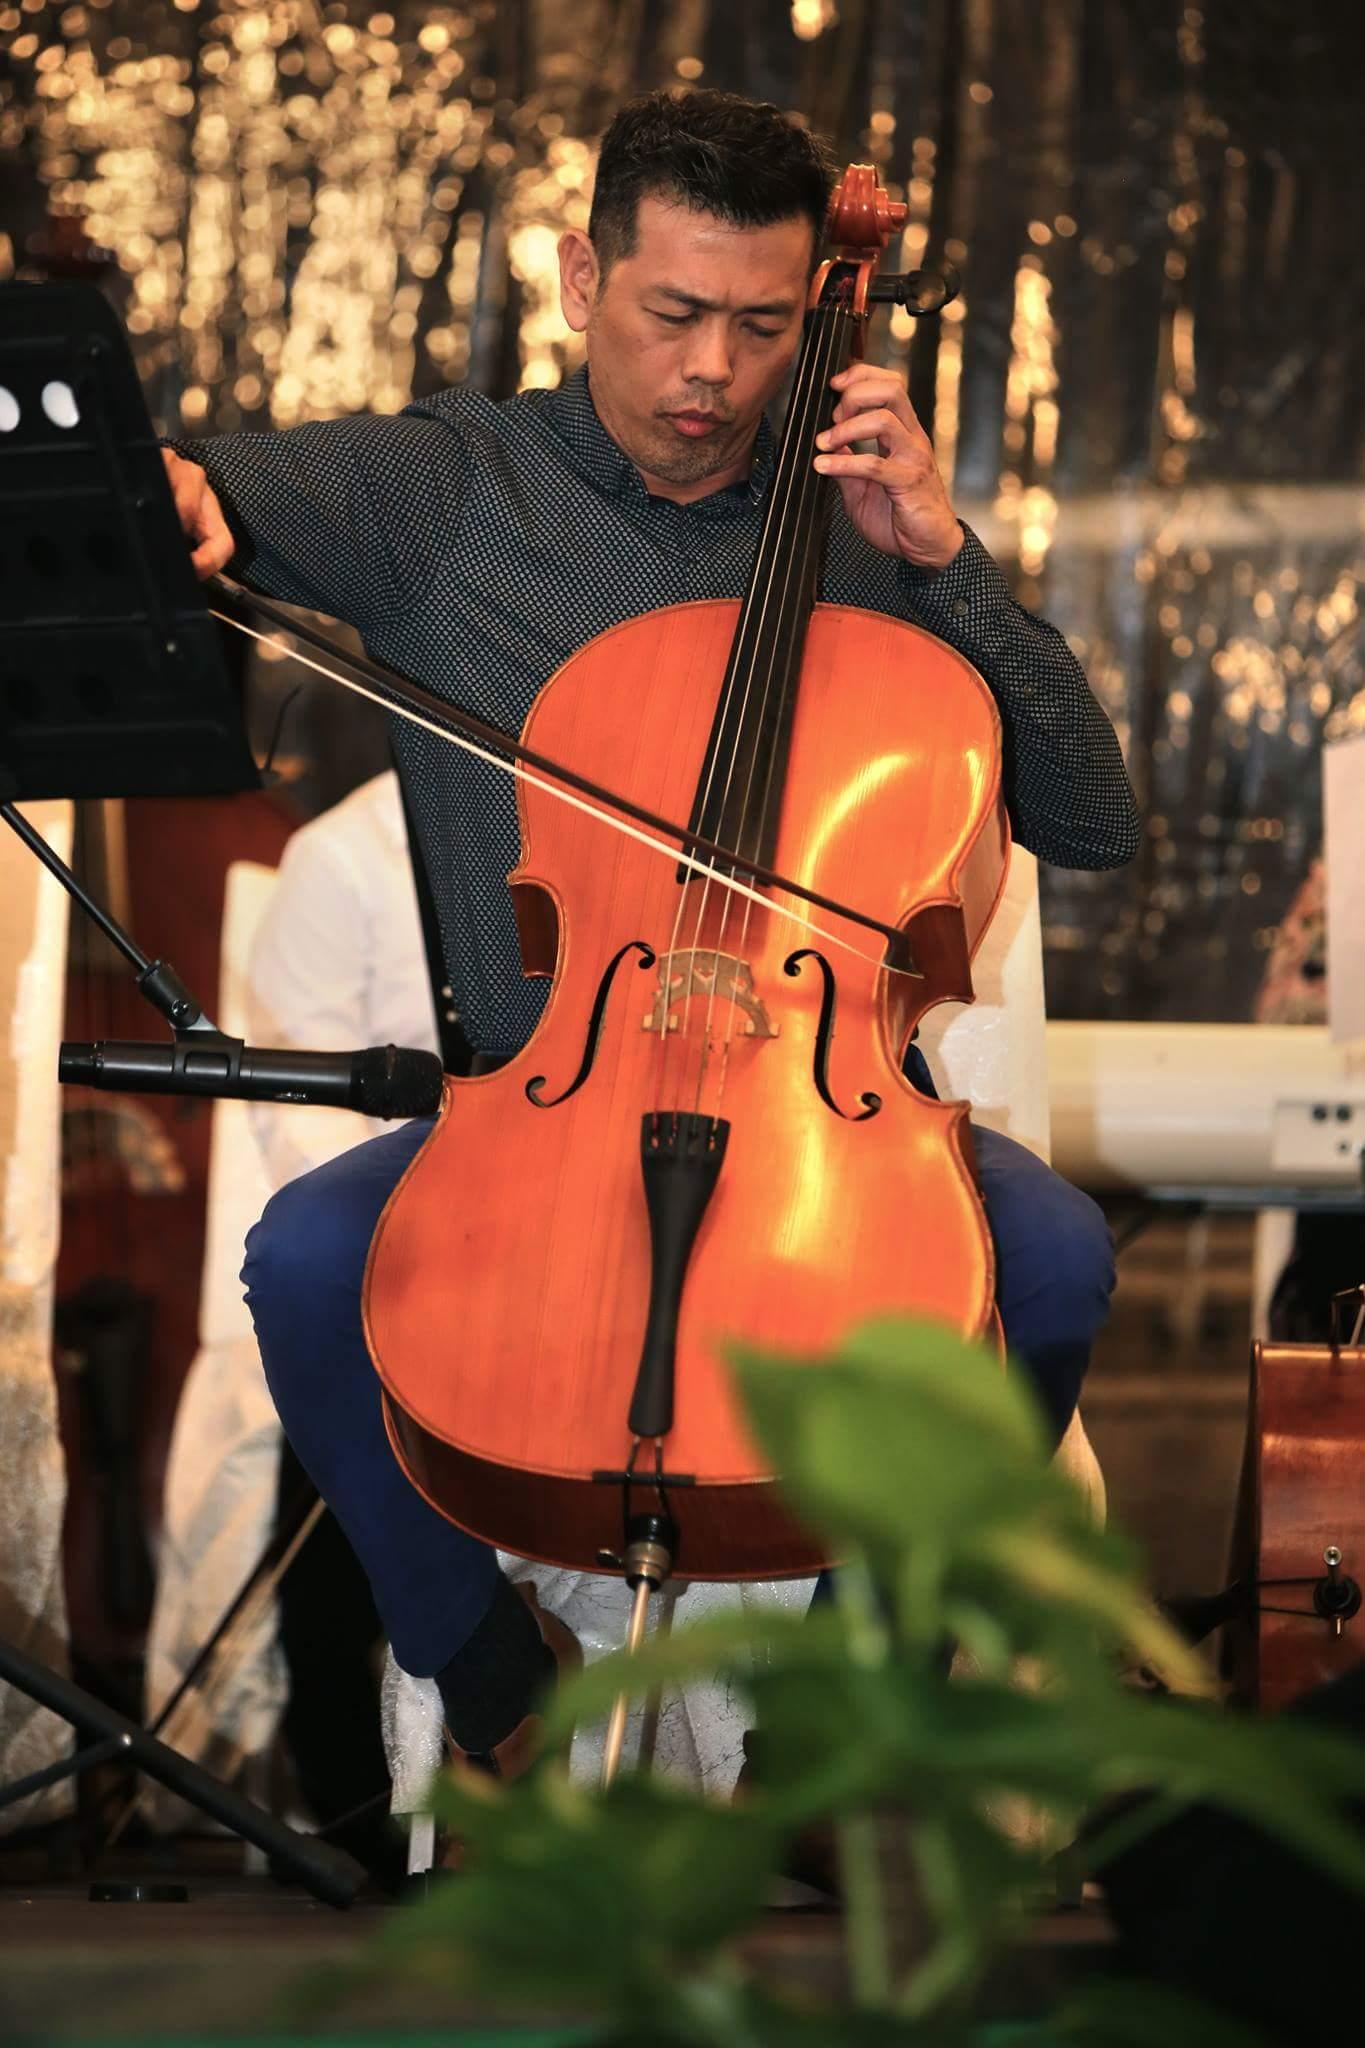 Guest Artiste Mr. Chan Wei Shing